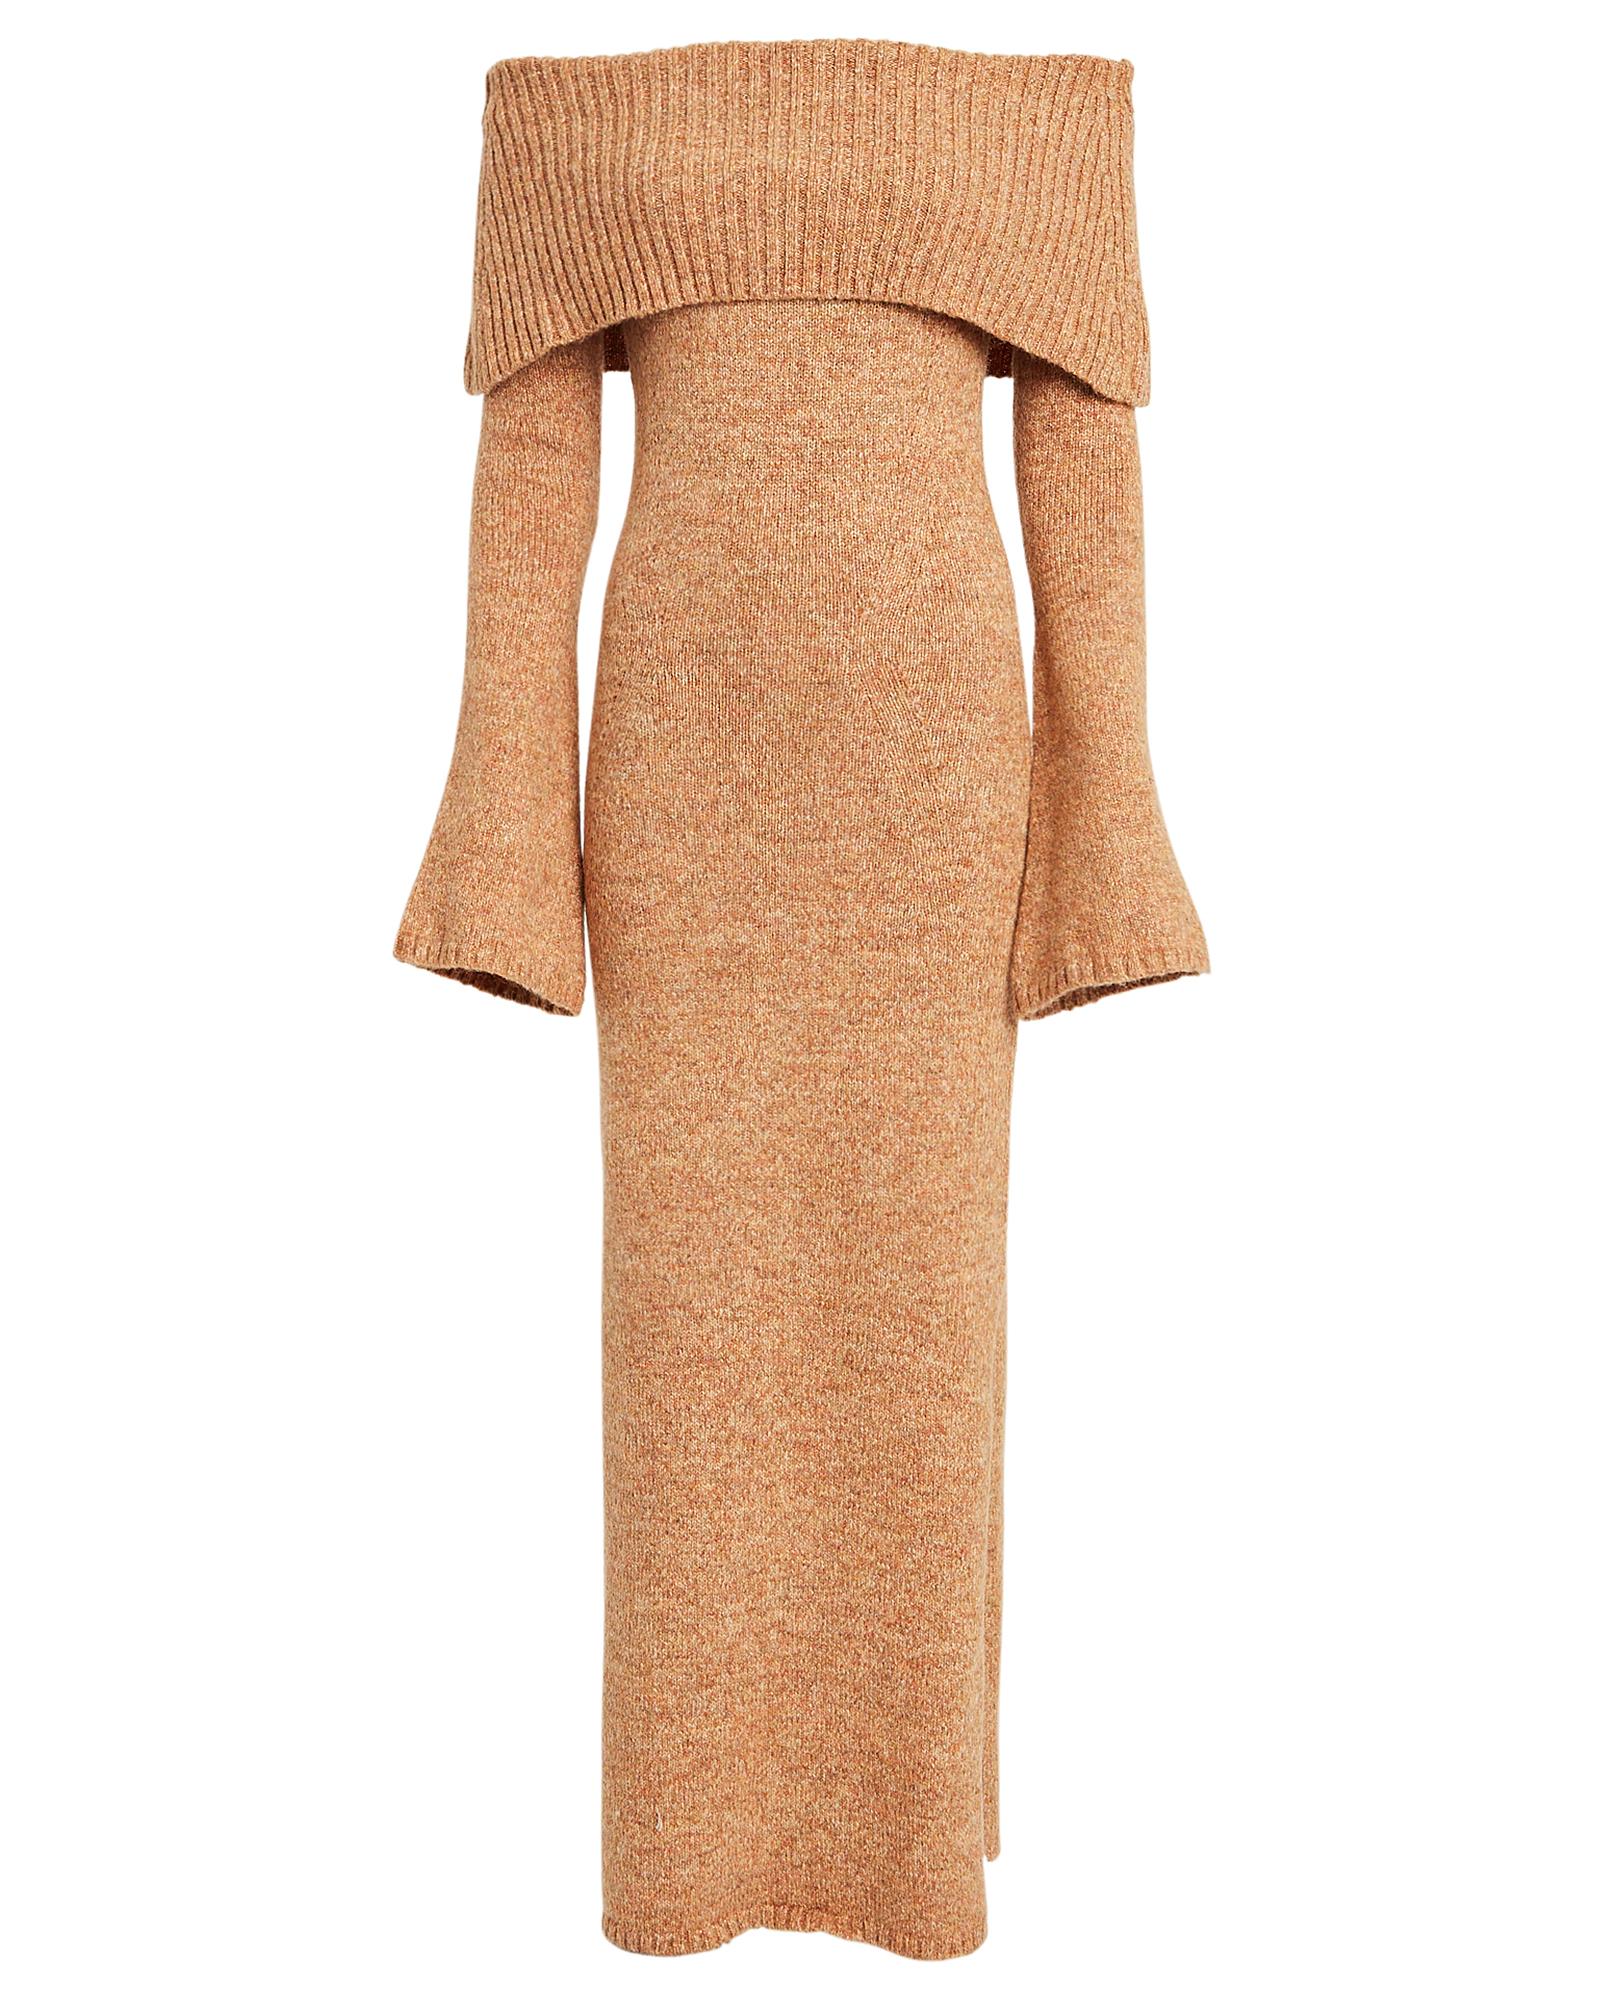 Cult Gaia Dresses CULT GAIA MARIEL SWEATER DRESS